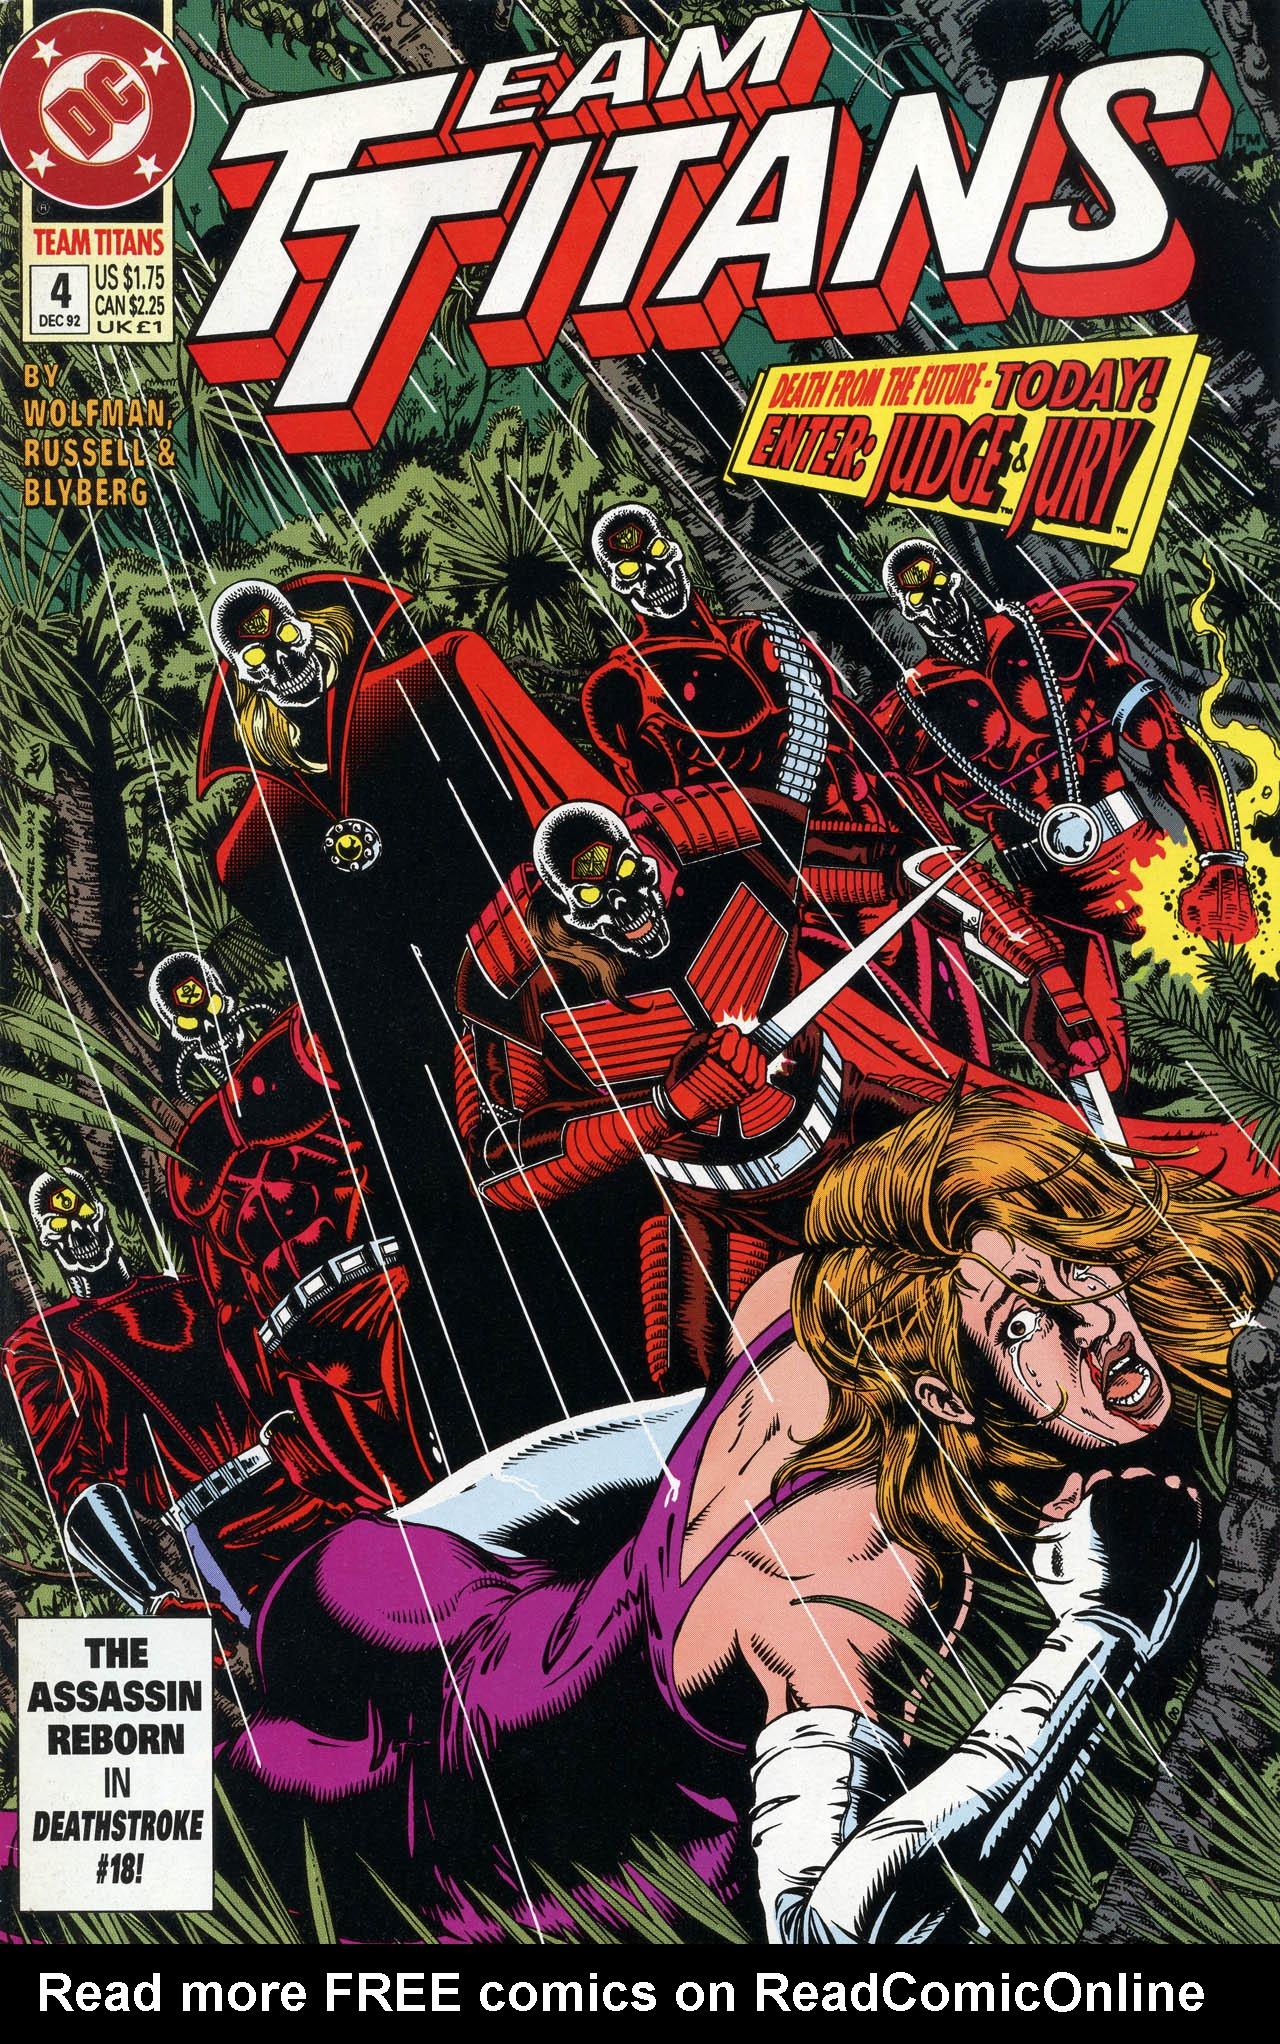 Read online Team Titans comic -  Issue #4 - 1